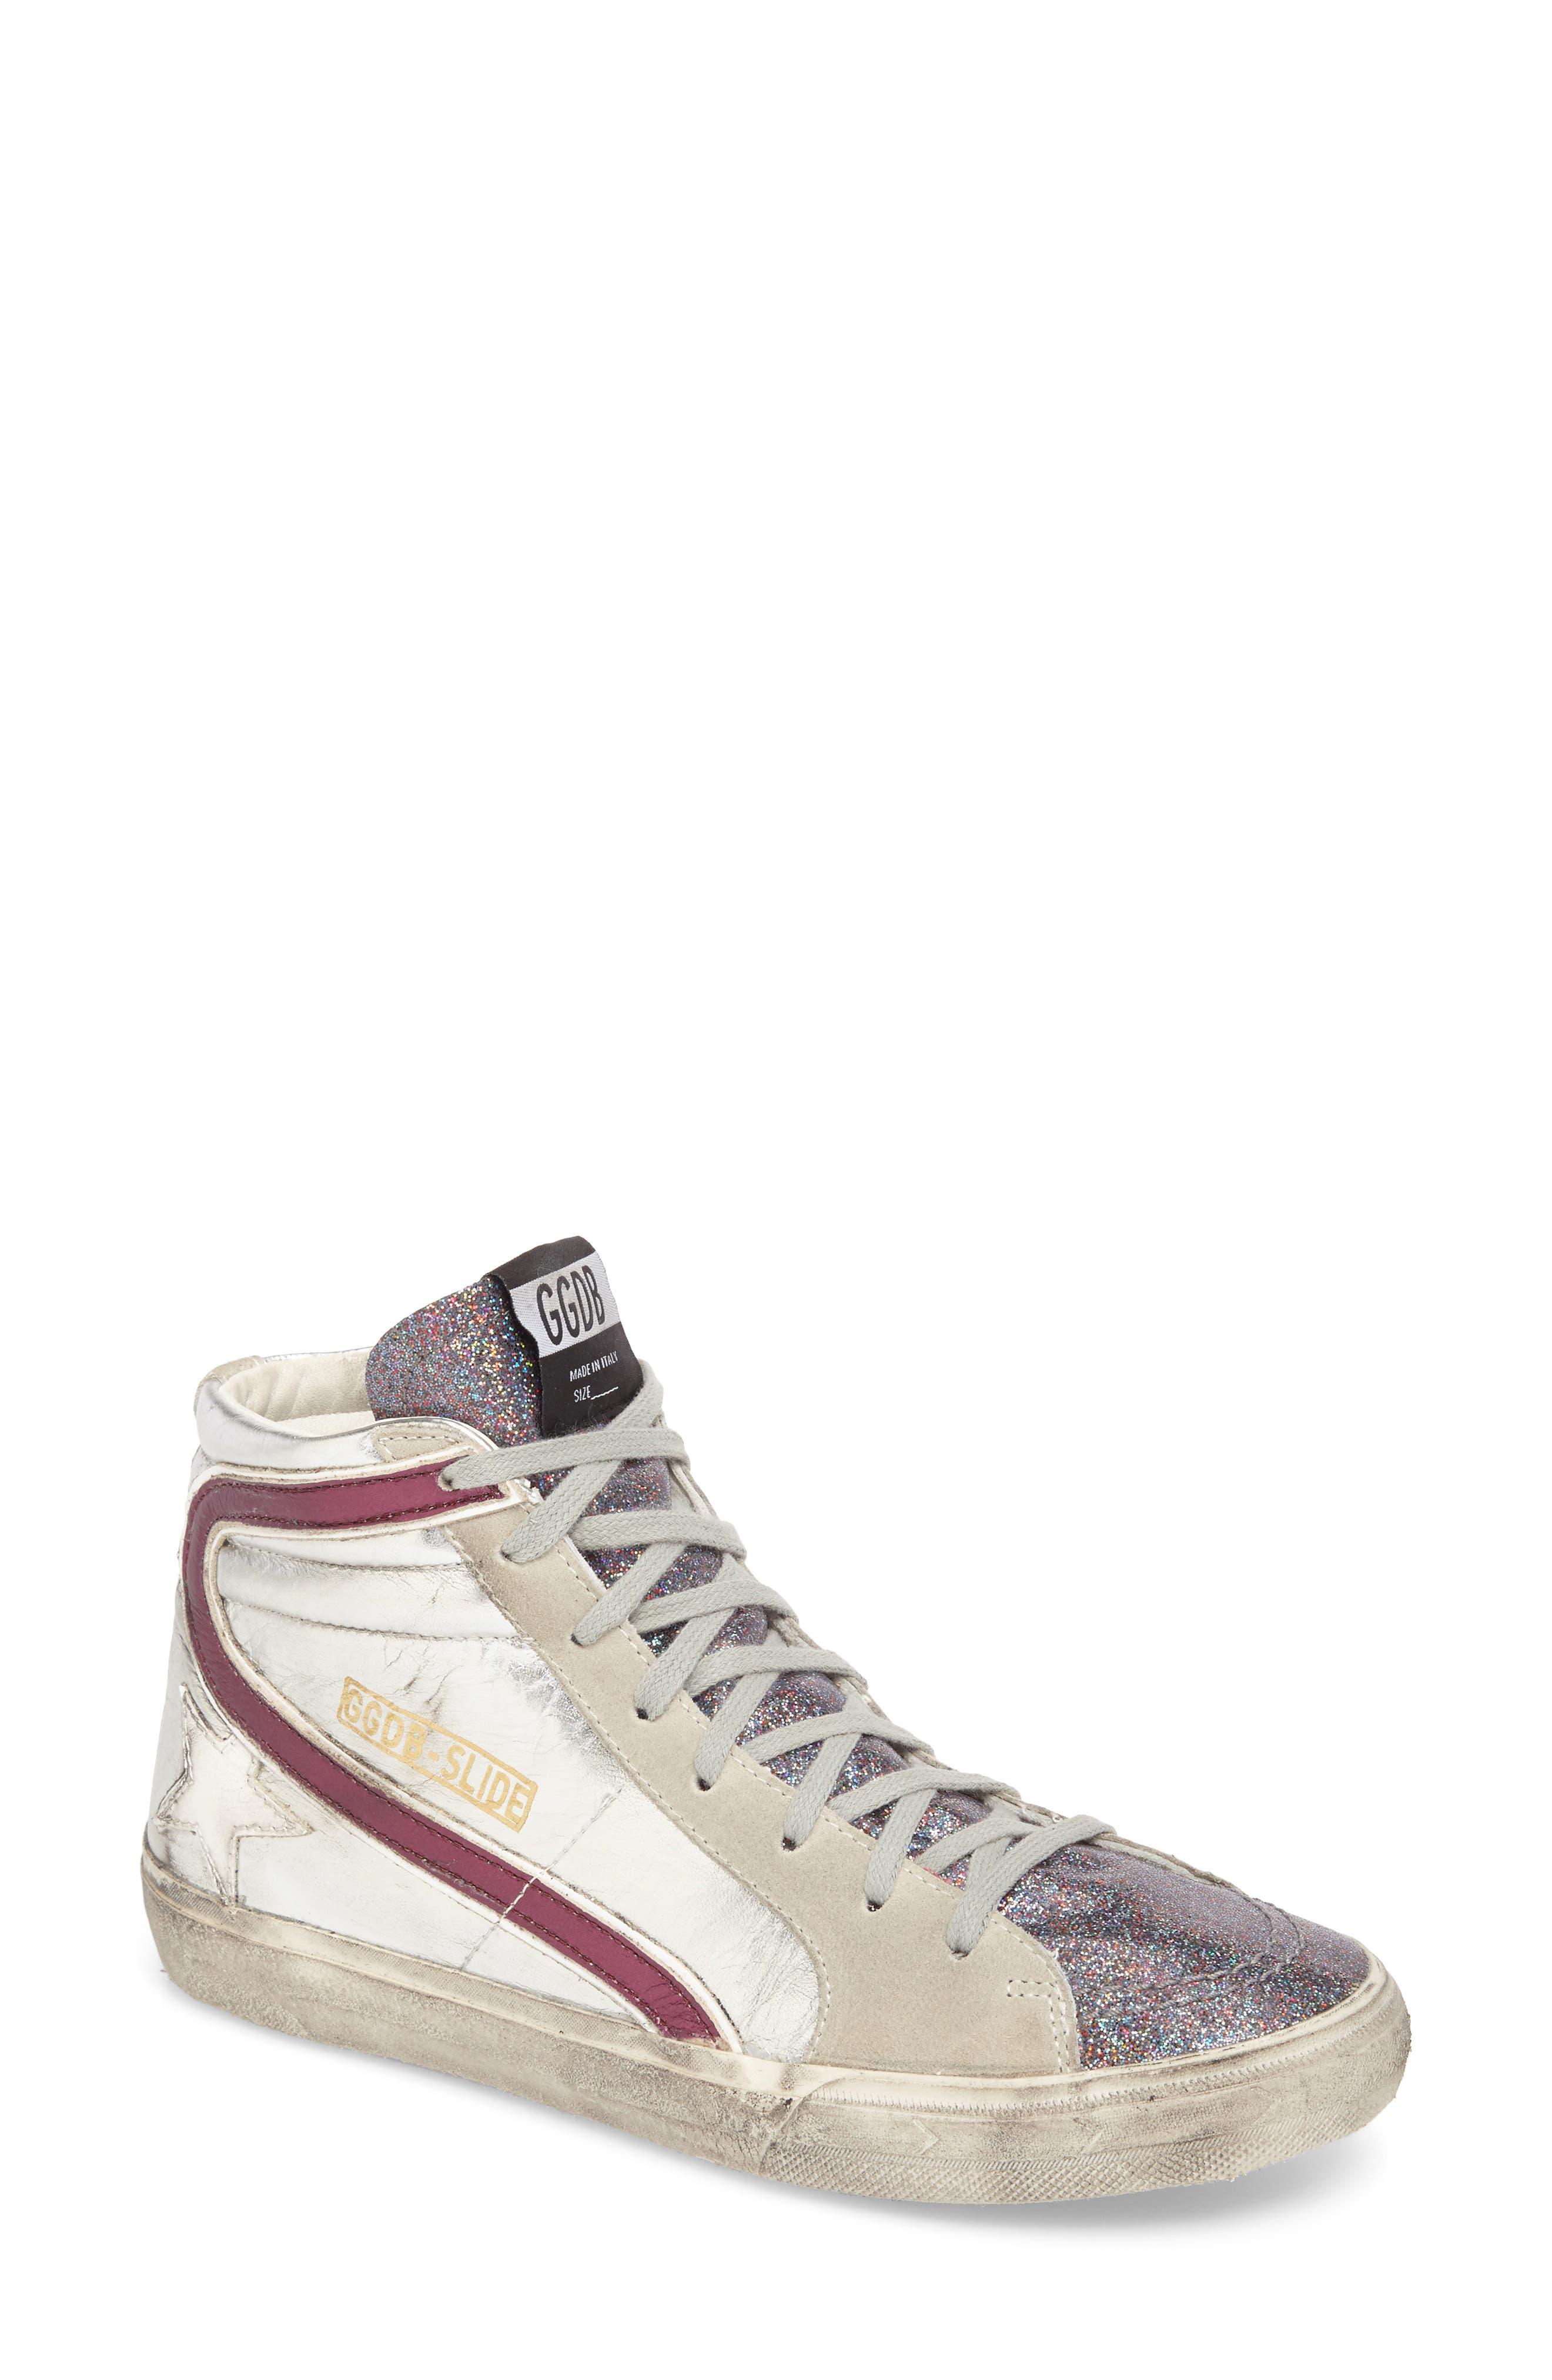 Slide High Top Sneaker,                         Main,                         color, 040